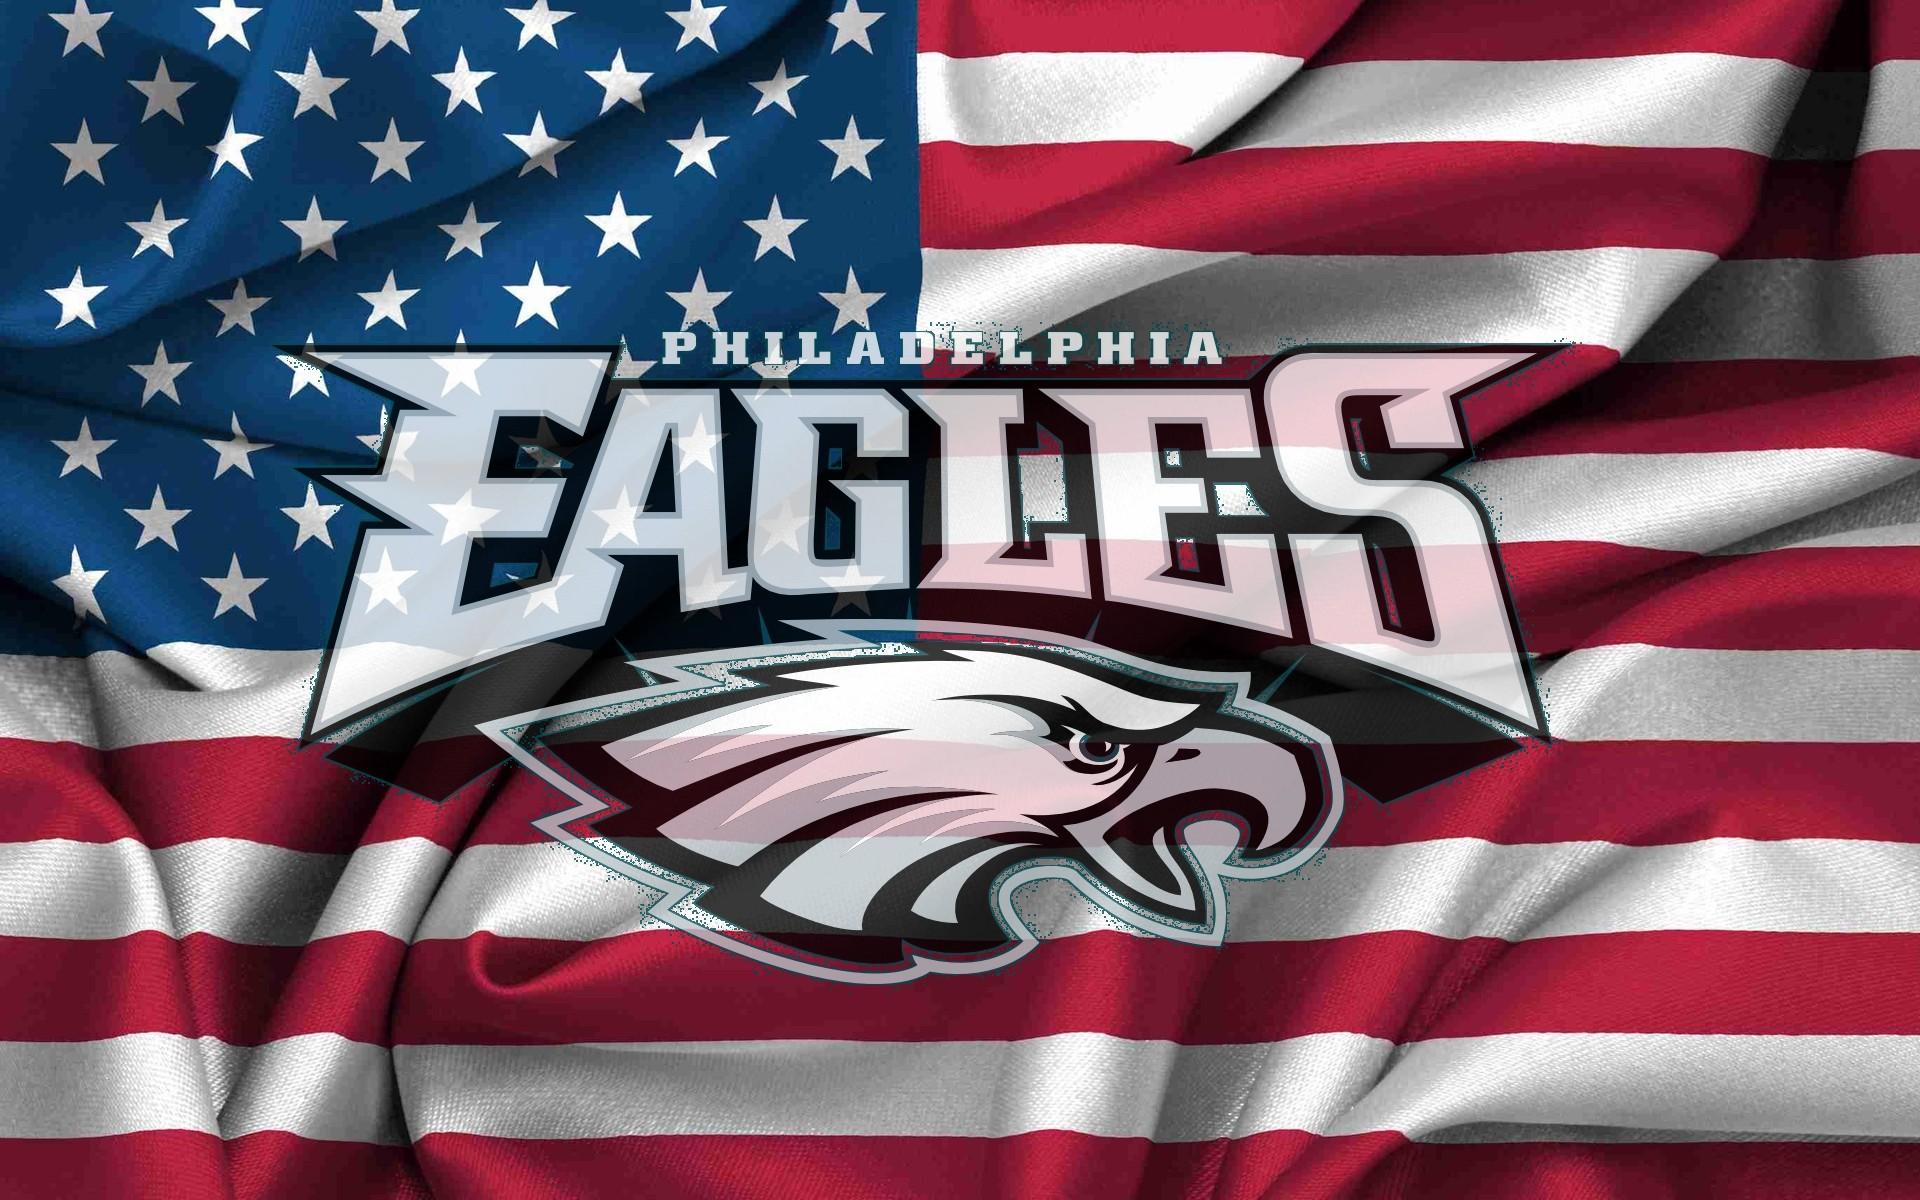 Philadelphia Eagles Logo On USA Flag Windy Canvas 1920x1200 WIDE NFL 1920x1200